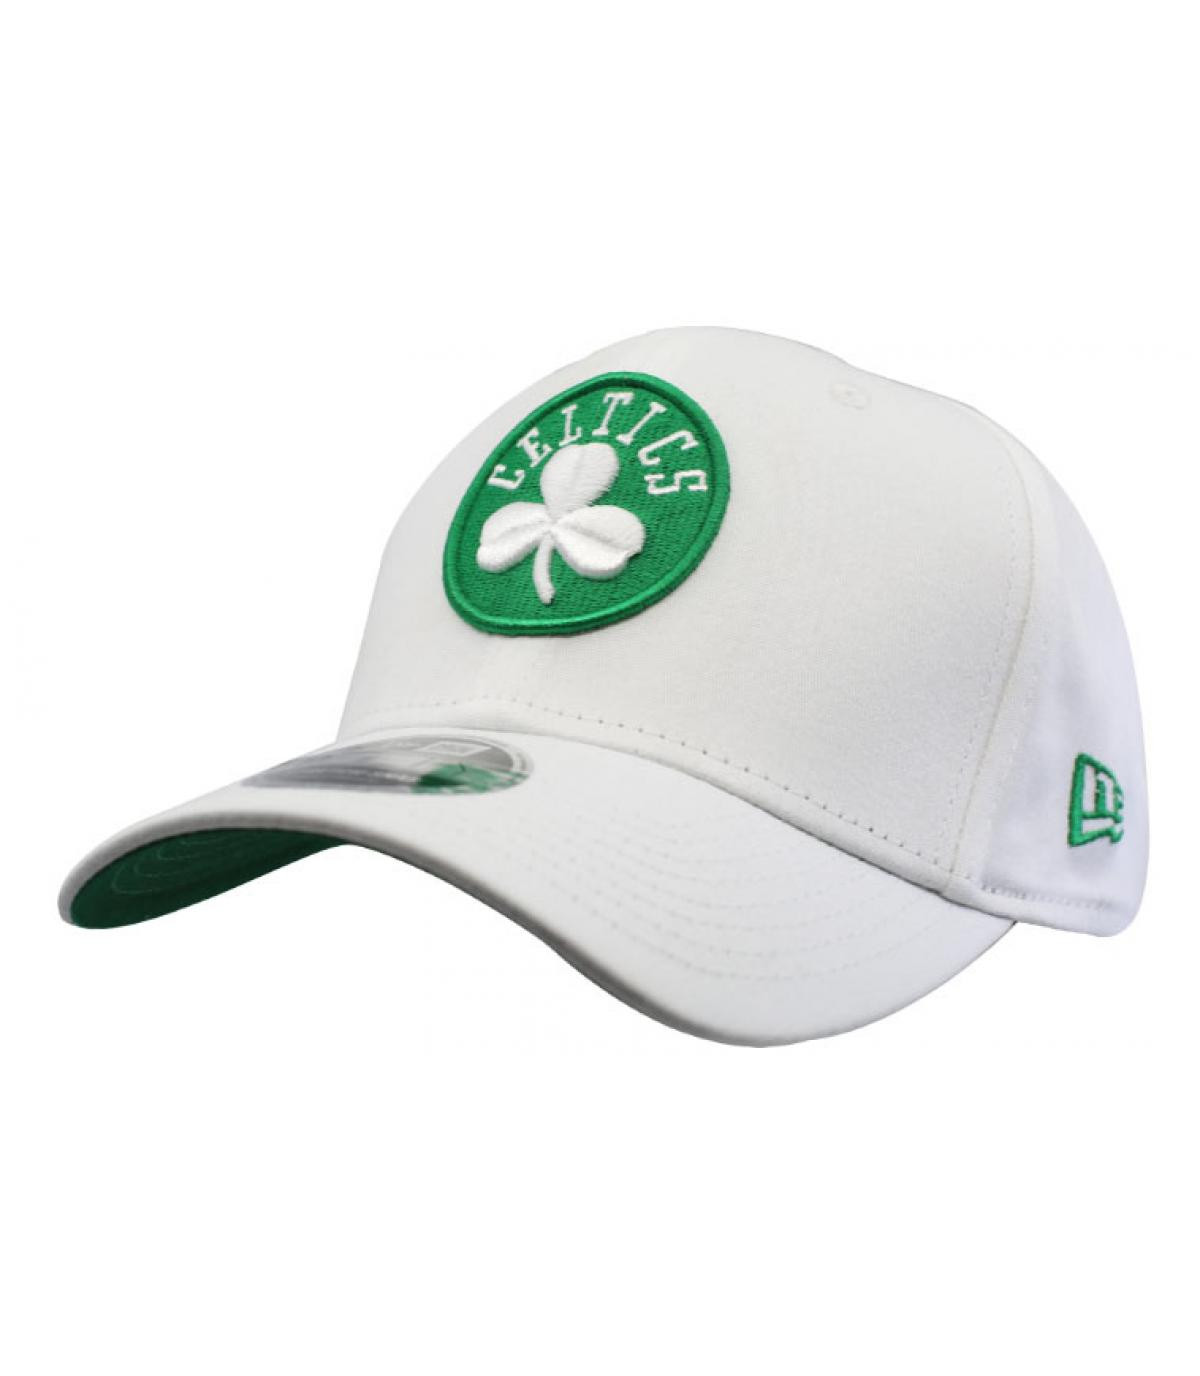 Detalles Stretch Snap 9Fifty Celtics imagen 2